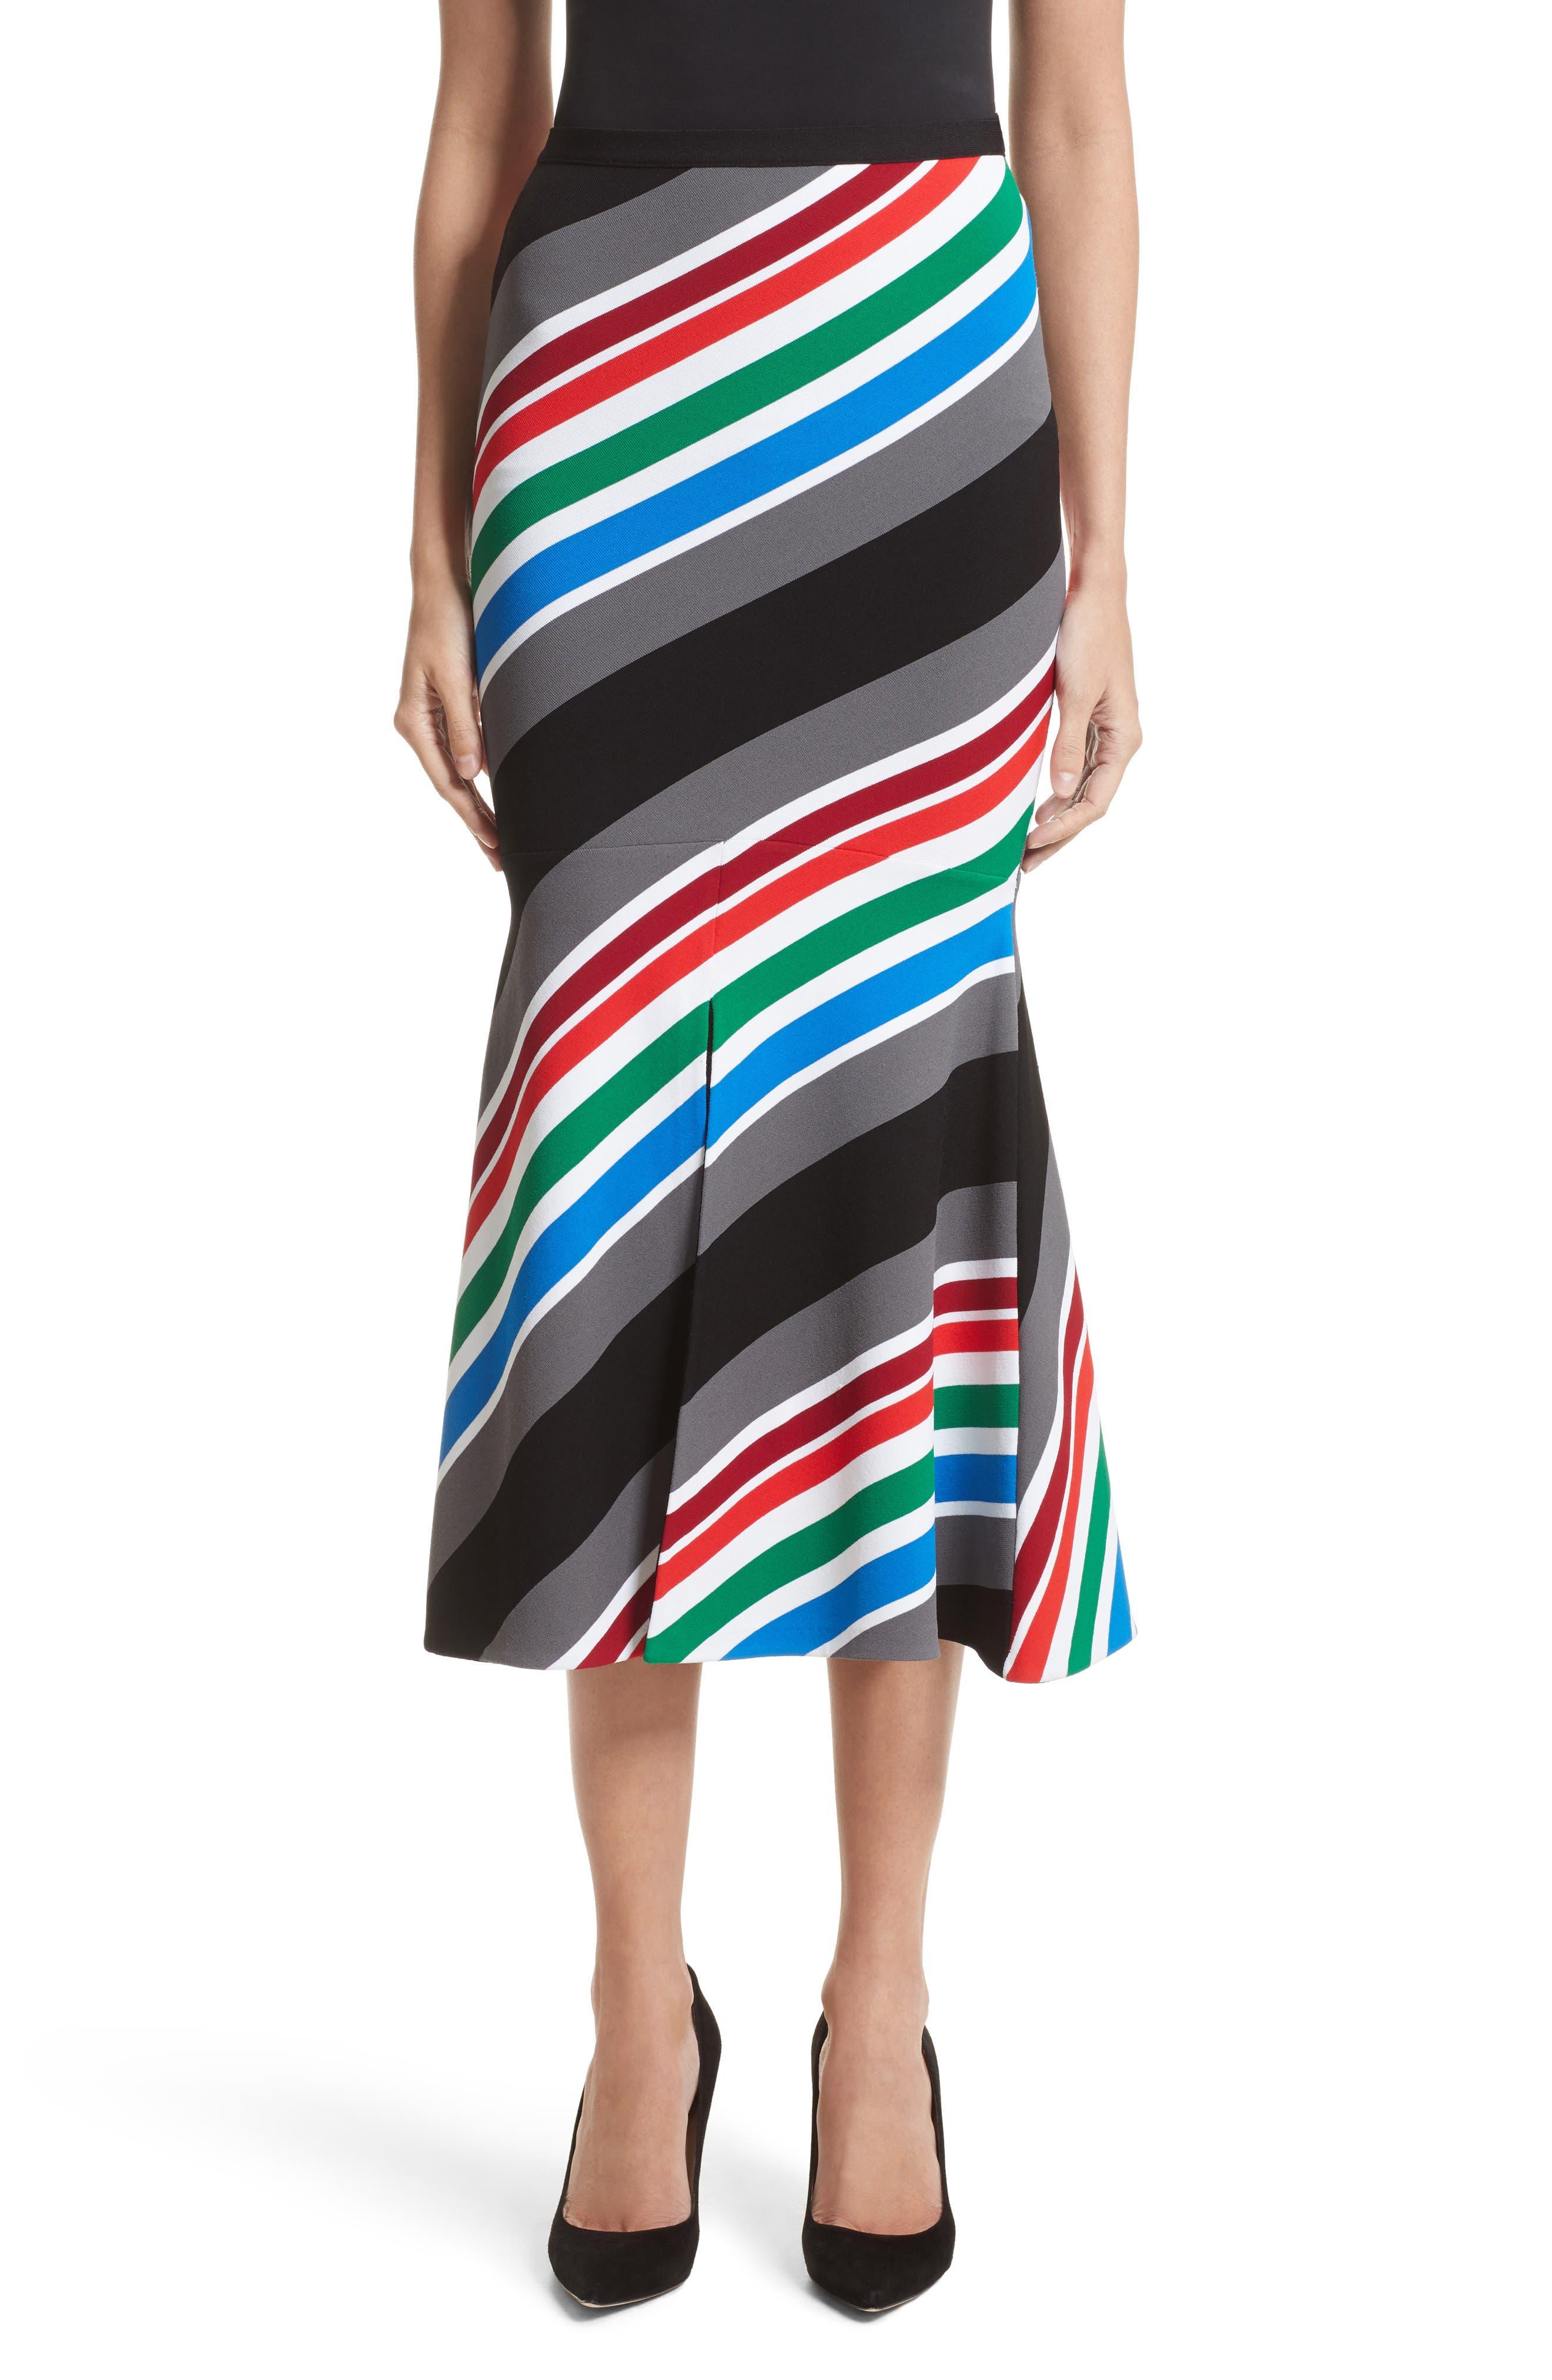 Alternate Image 1 Selected - Oscar de la Renta Compact Knit Stripe Skirt